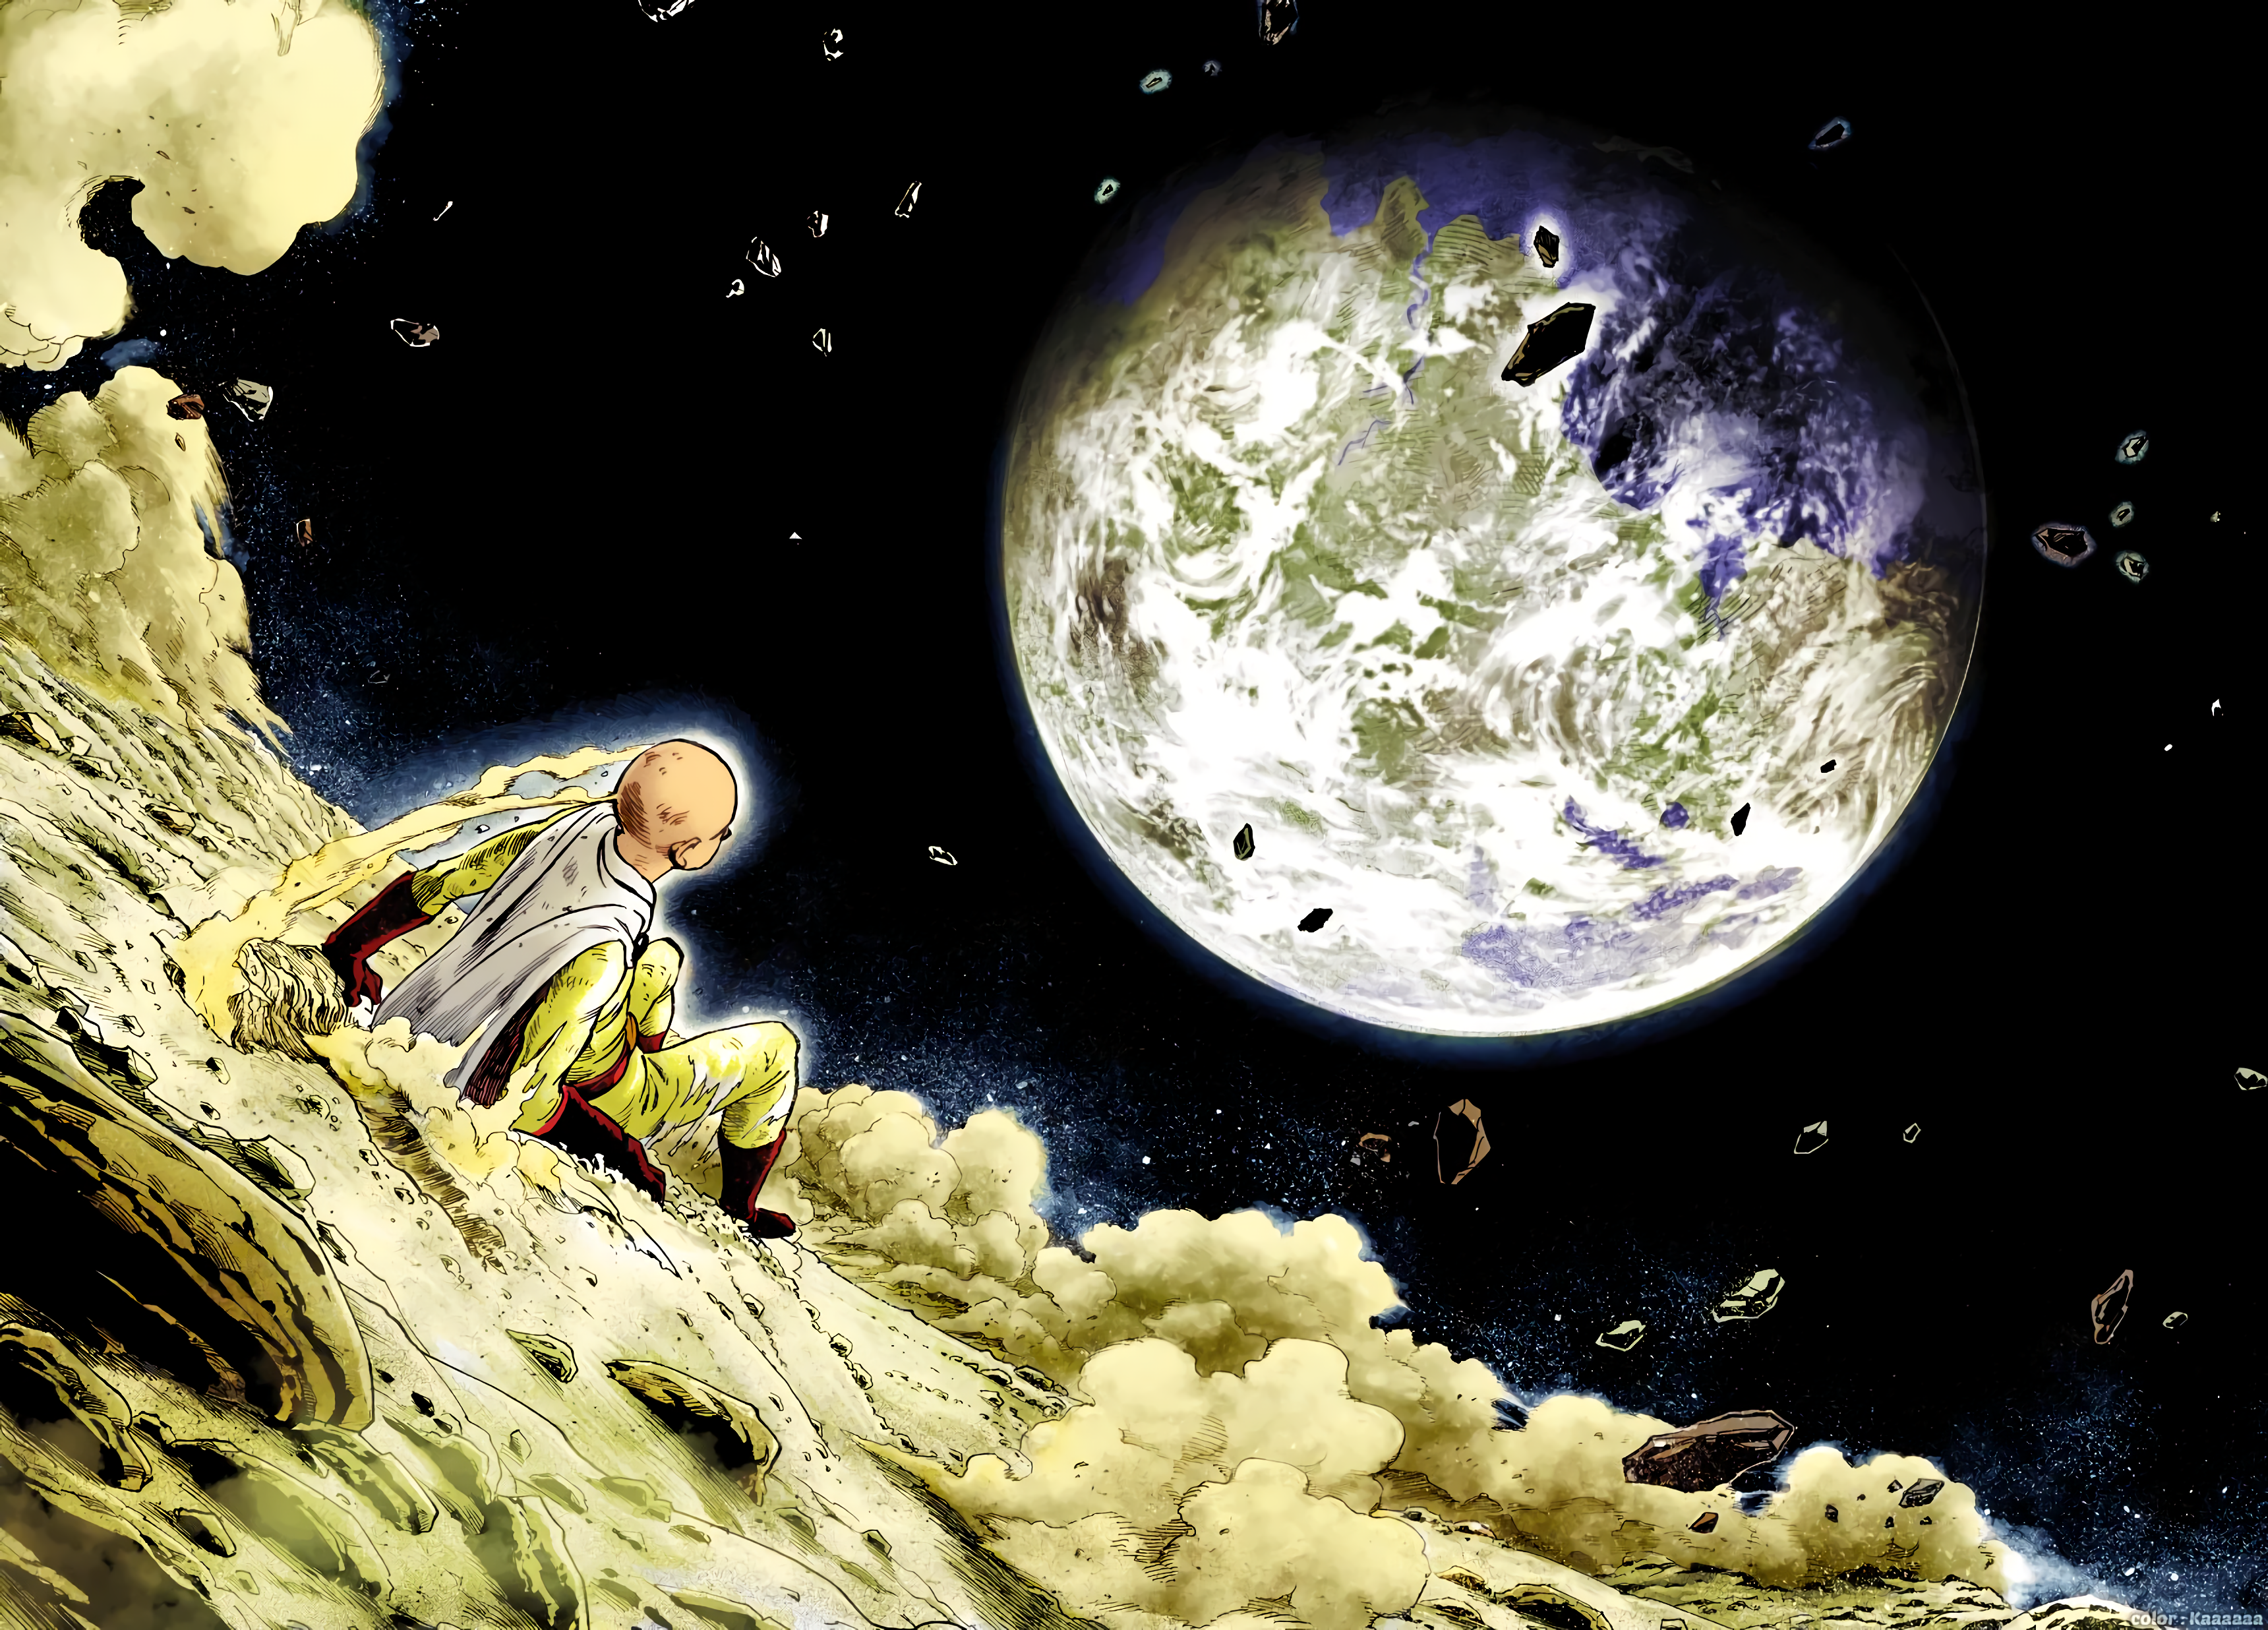 Anime 3440x2472 anime anime boys white skin One-Punch Man fan art Saitama superhero dark background night space planet